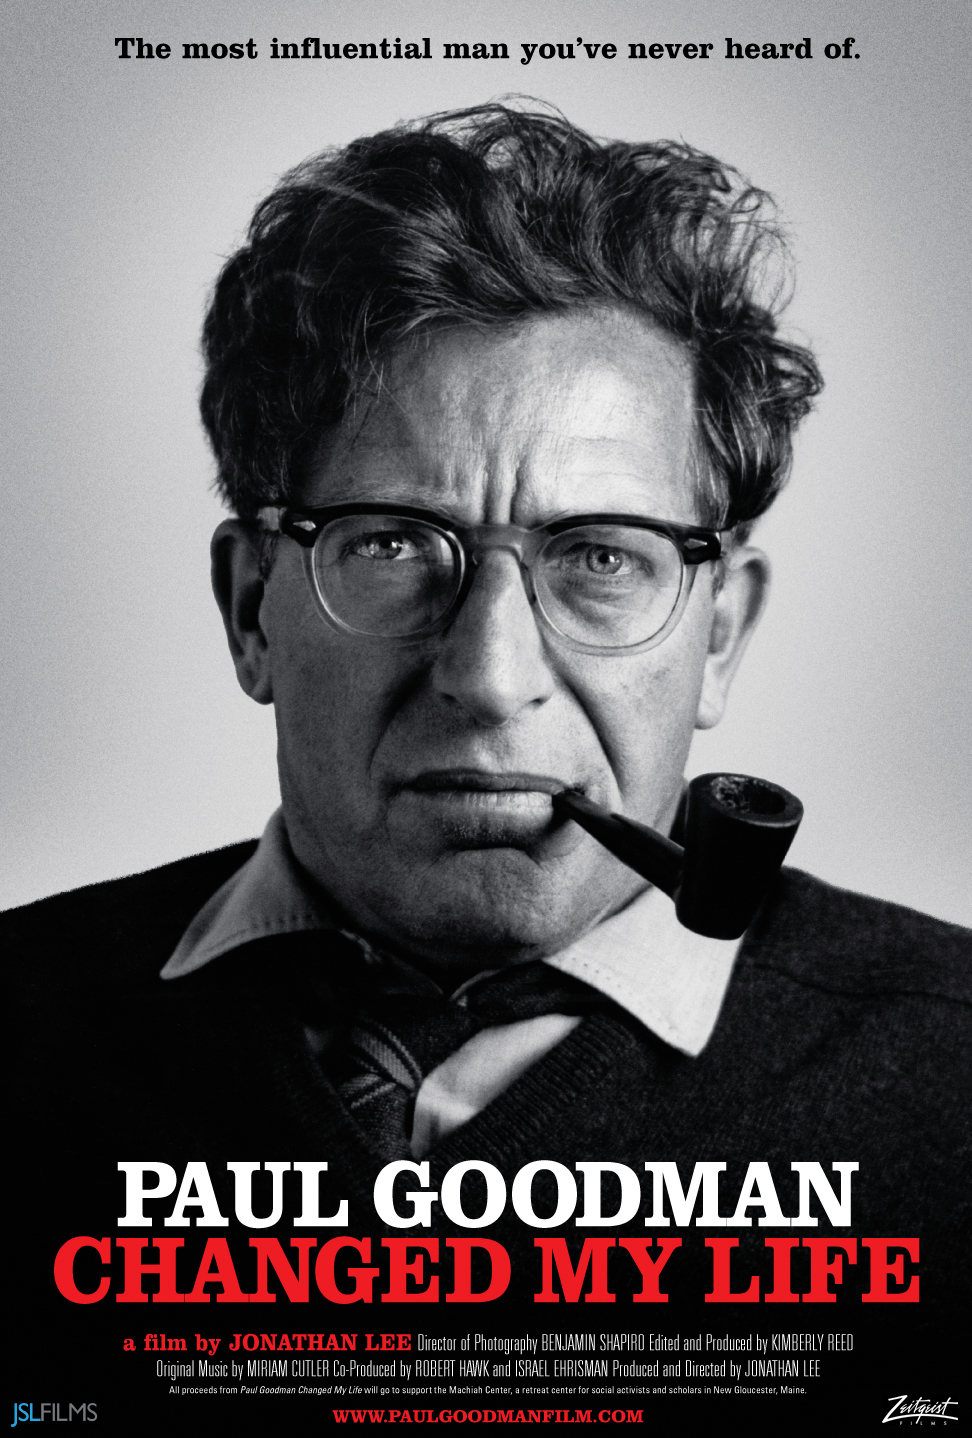 Paul_Goodman_Changed_My_Life_poster.jpg